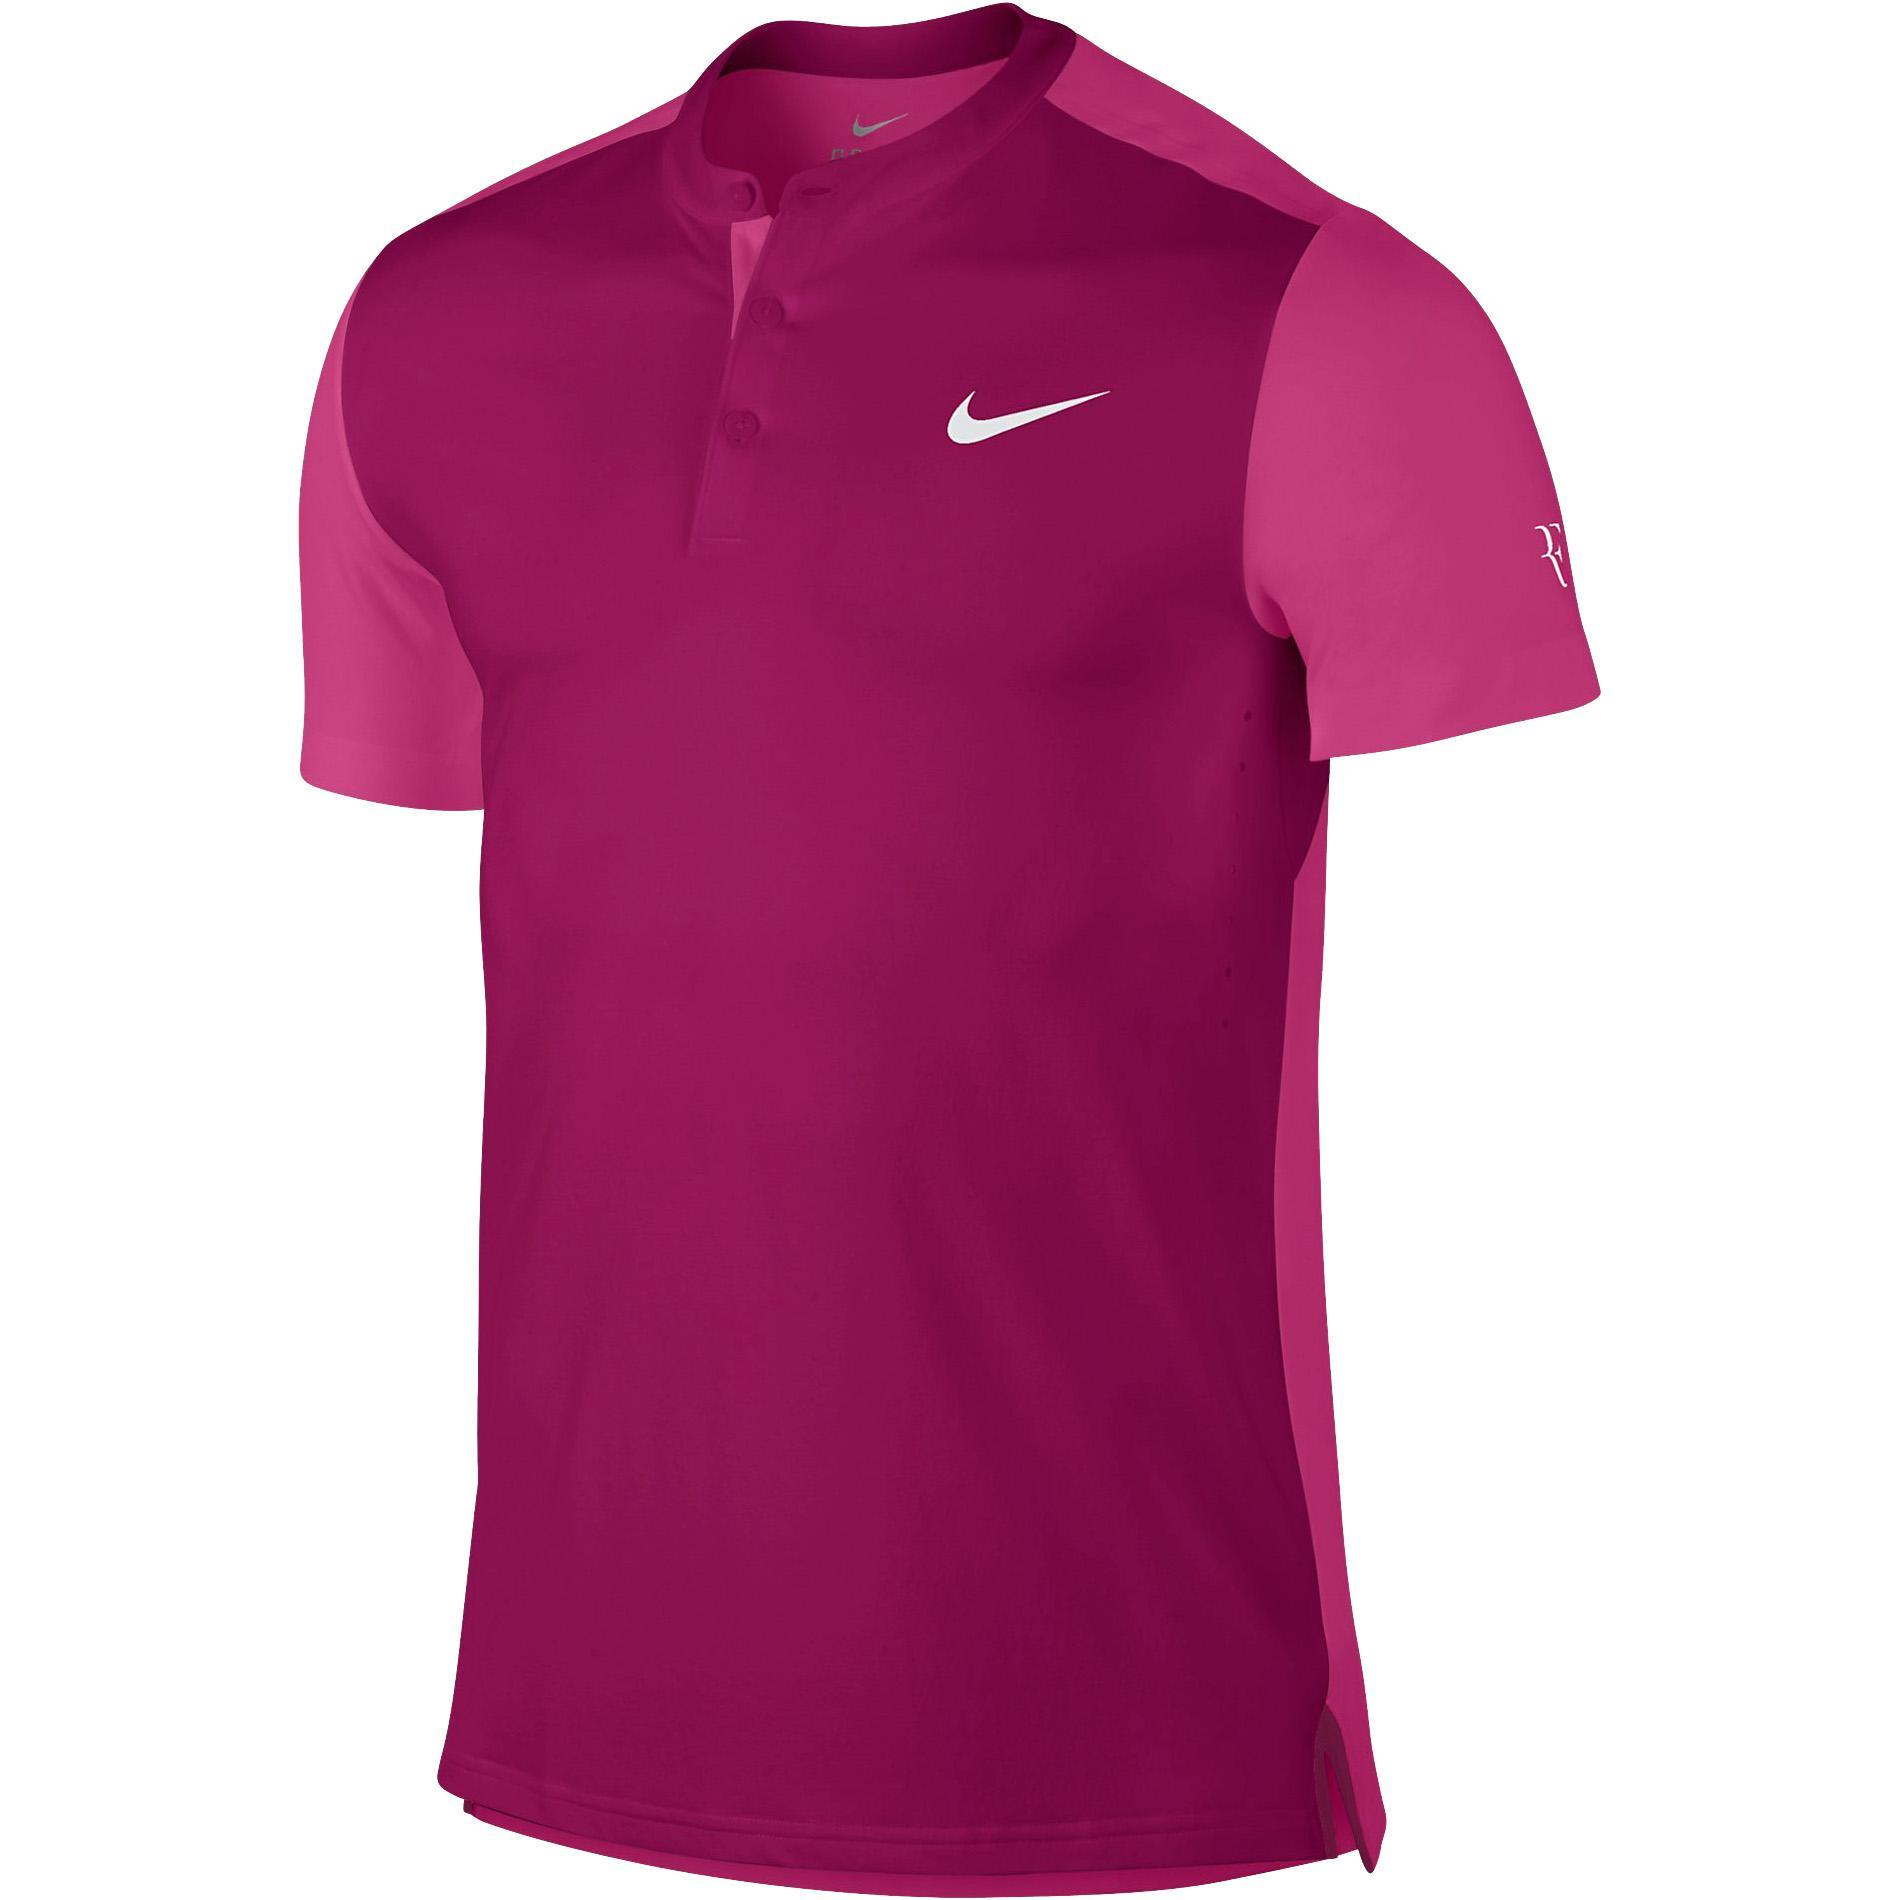 0377b6bb Nike Mens Premier RF Henley Shirt - Sport Fuchsia/Vivid Pink -  Tennisnuts.com